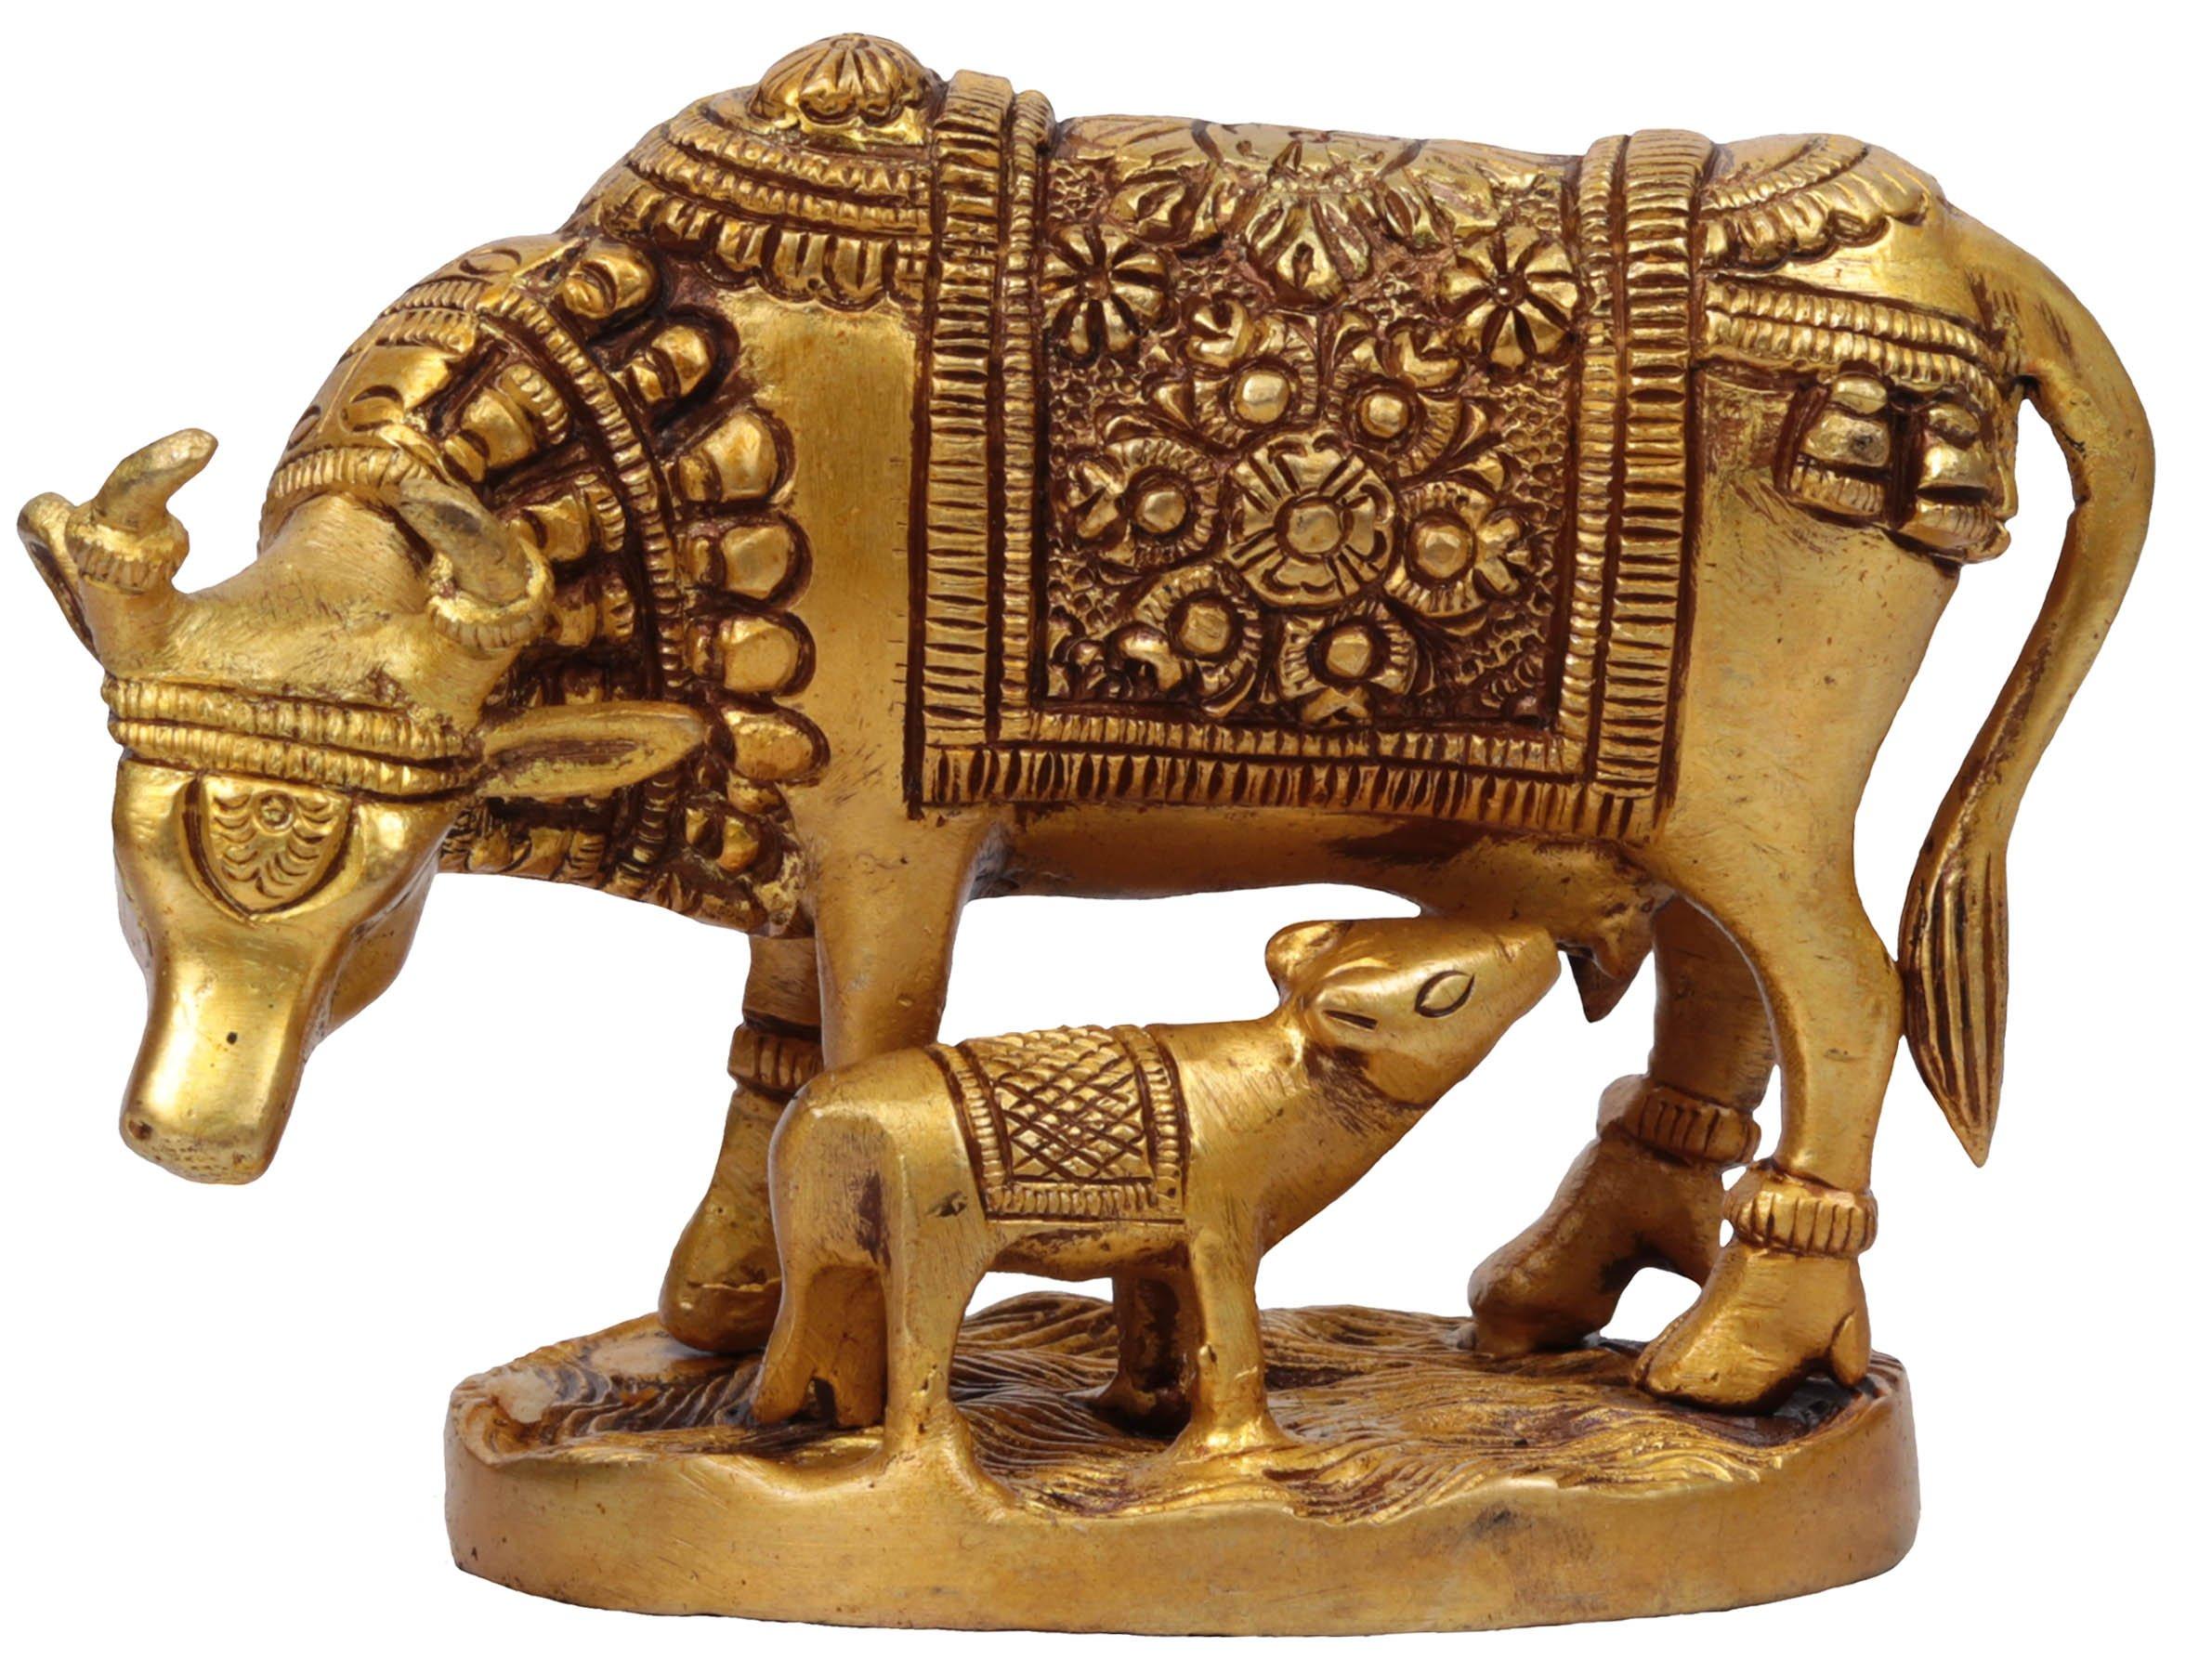 Hindu Statues & Sculptures: Shiva Linga, Nataraja & Ganesha Statue